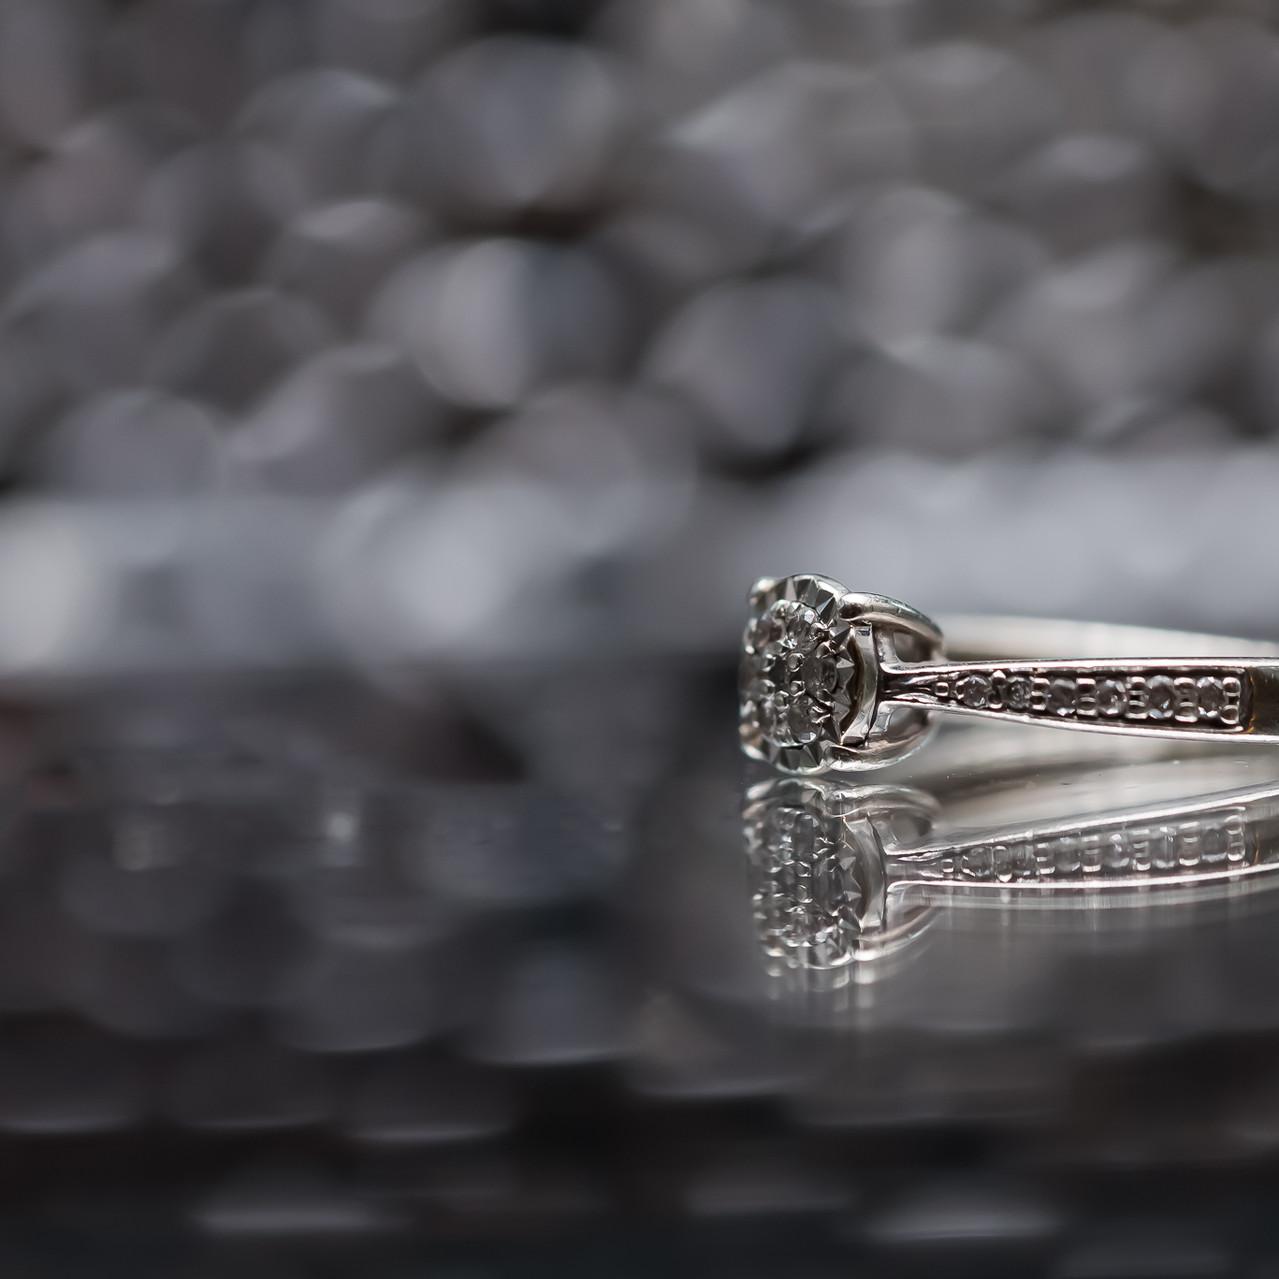 Fay Wedding - Thursford Collection at the Garden Pavilion, Norfolk. Wedding Ring.